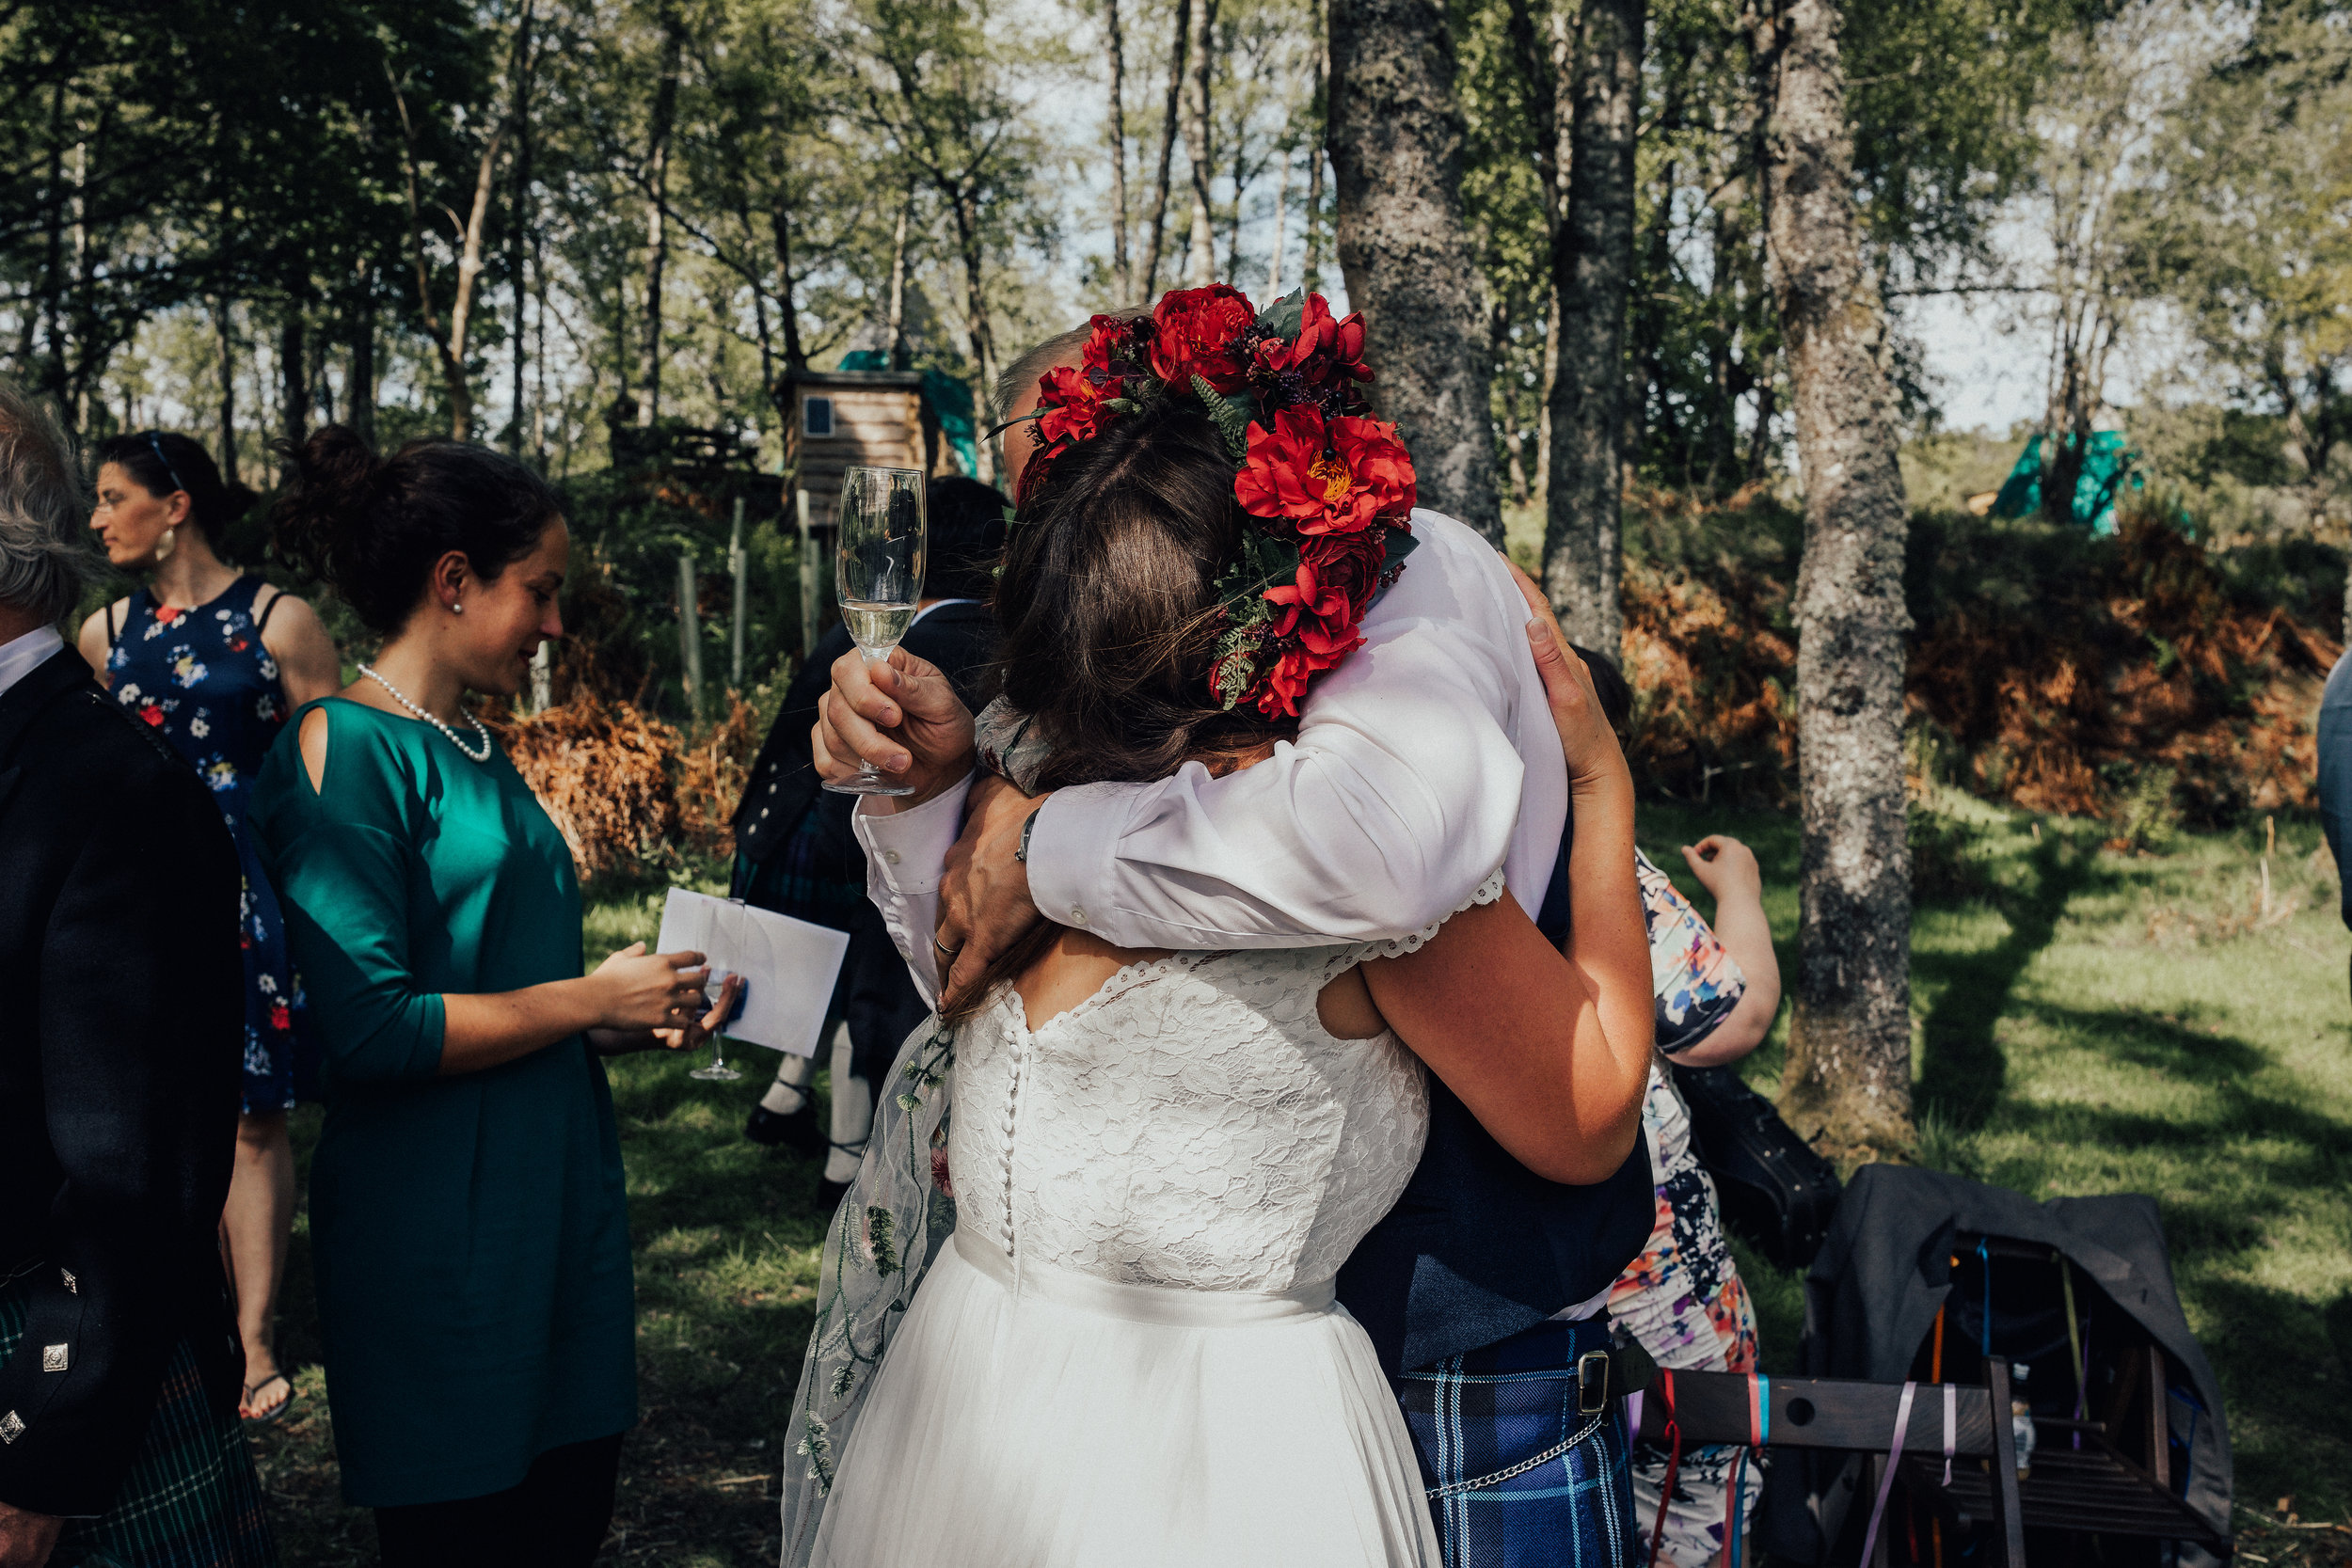 COMRIE_CROFT_WEDDINGS_PJ_PHILLIPS_PHOTOGRAPHY_93.jpg